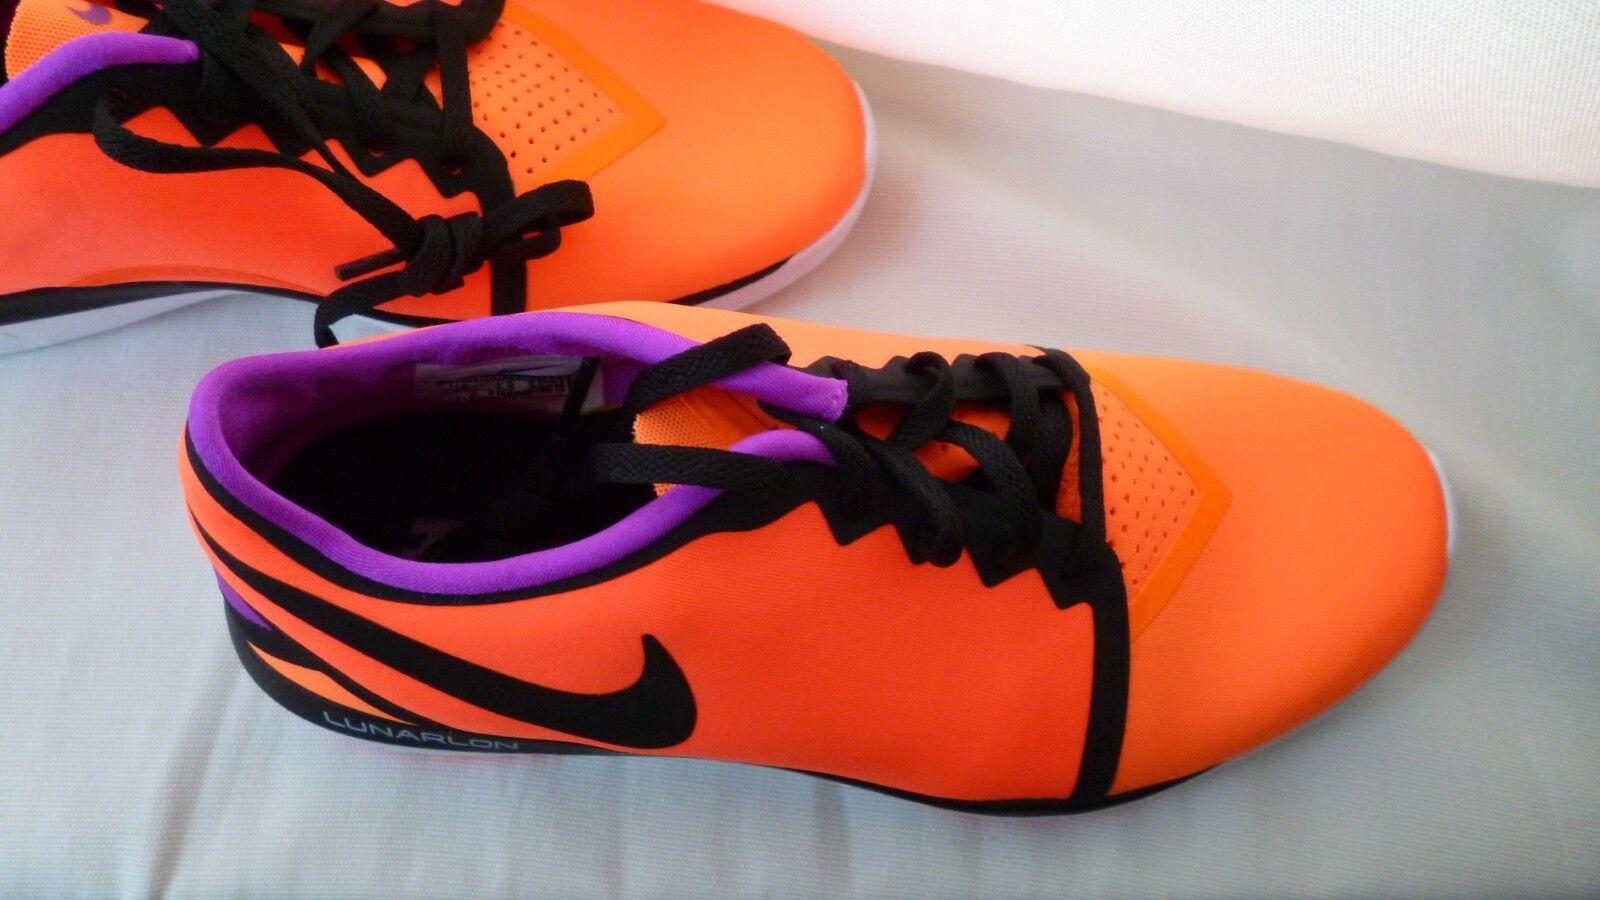 Sneaker Turnschuhe   NIKE   LUNARLON  orange/lila/schwarz   Gr.36,5  orange/lila/schwarz    23cm  NEU d4827b